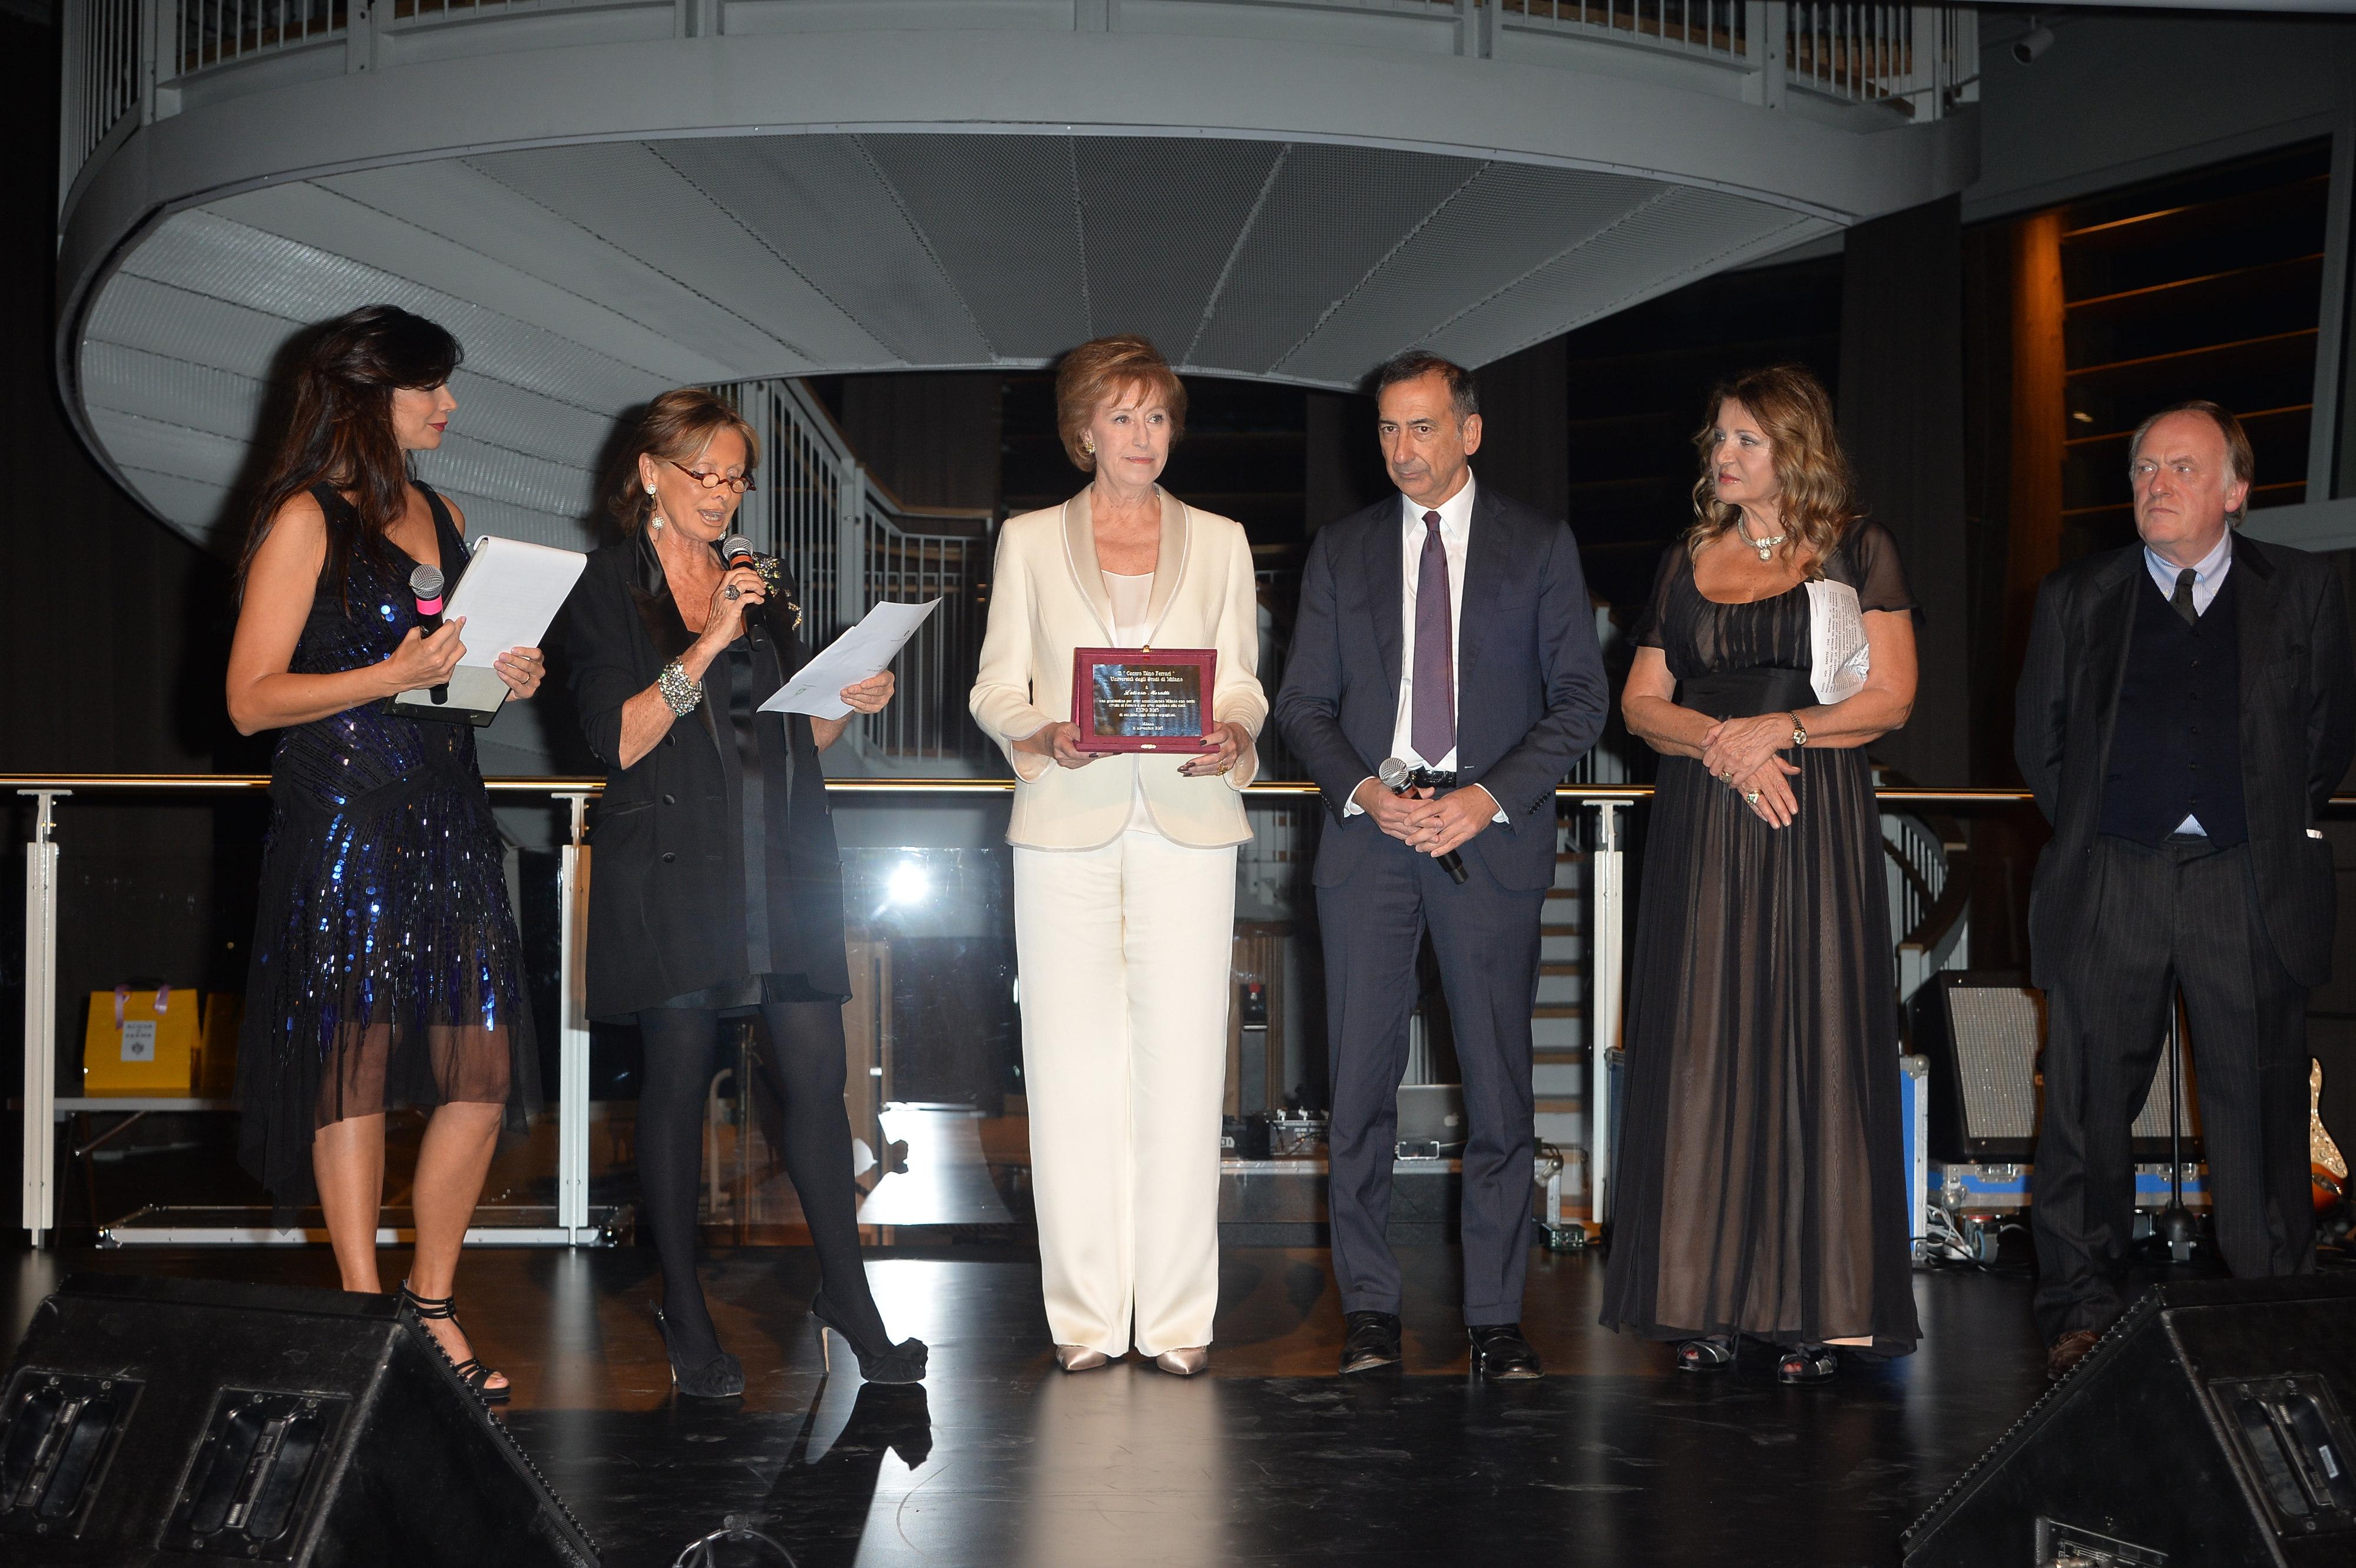 Luisa Corna;Manuela Consensi;Letizia Moratti;Giuseppe Sala;Maria Luisa Trussardi;Nereo Bresolin